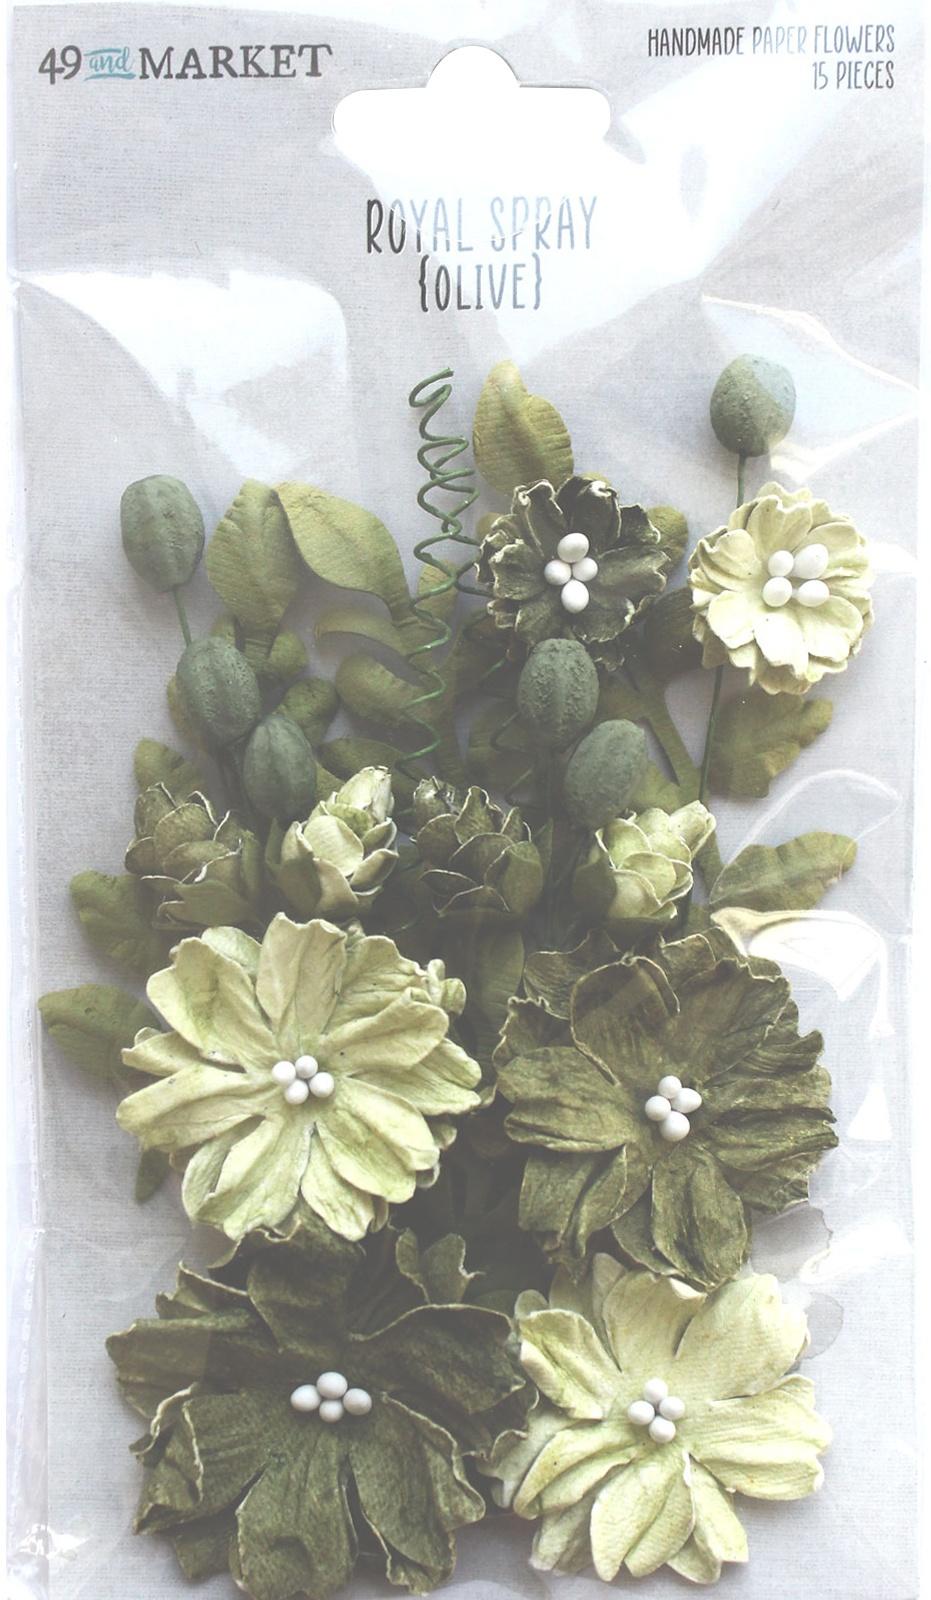 49 And Market Royal Spray Paper Flowers 15/Pkg-Olive